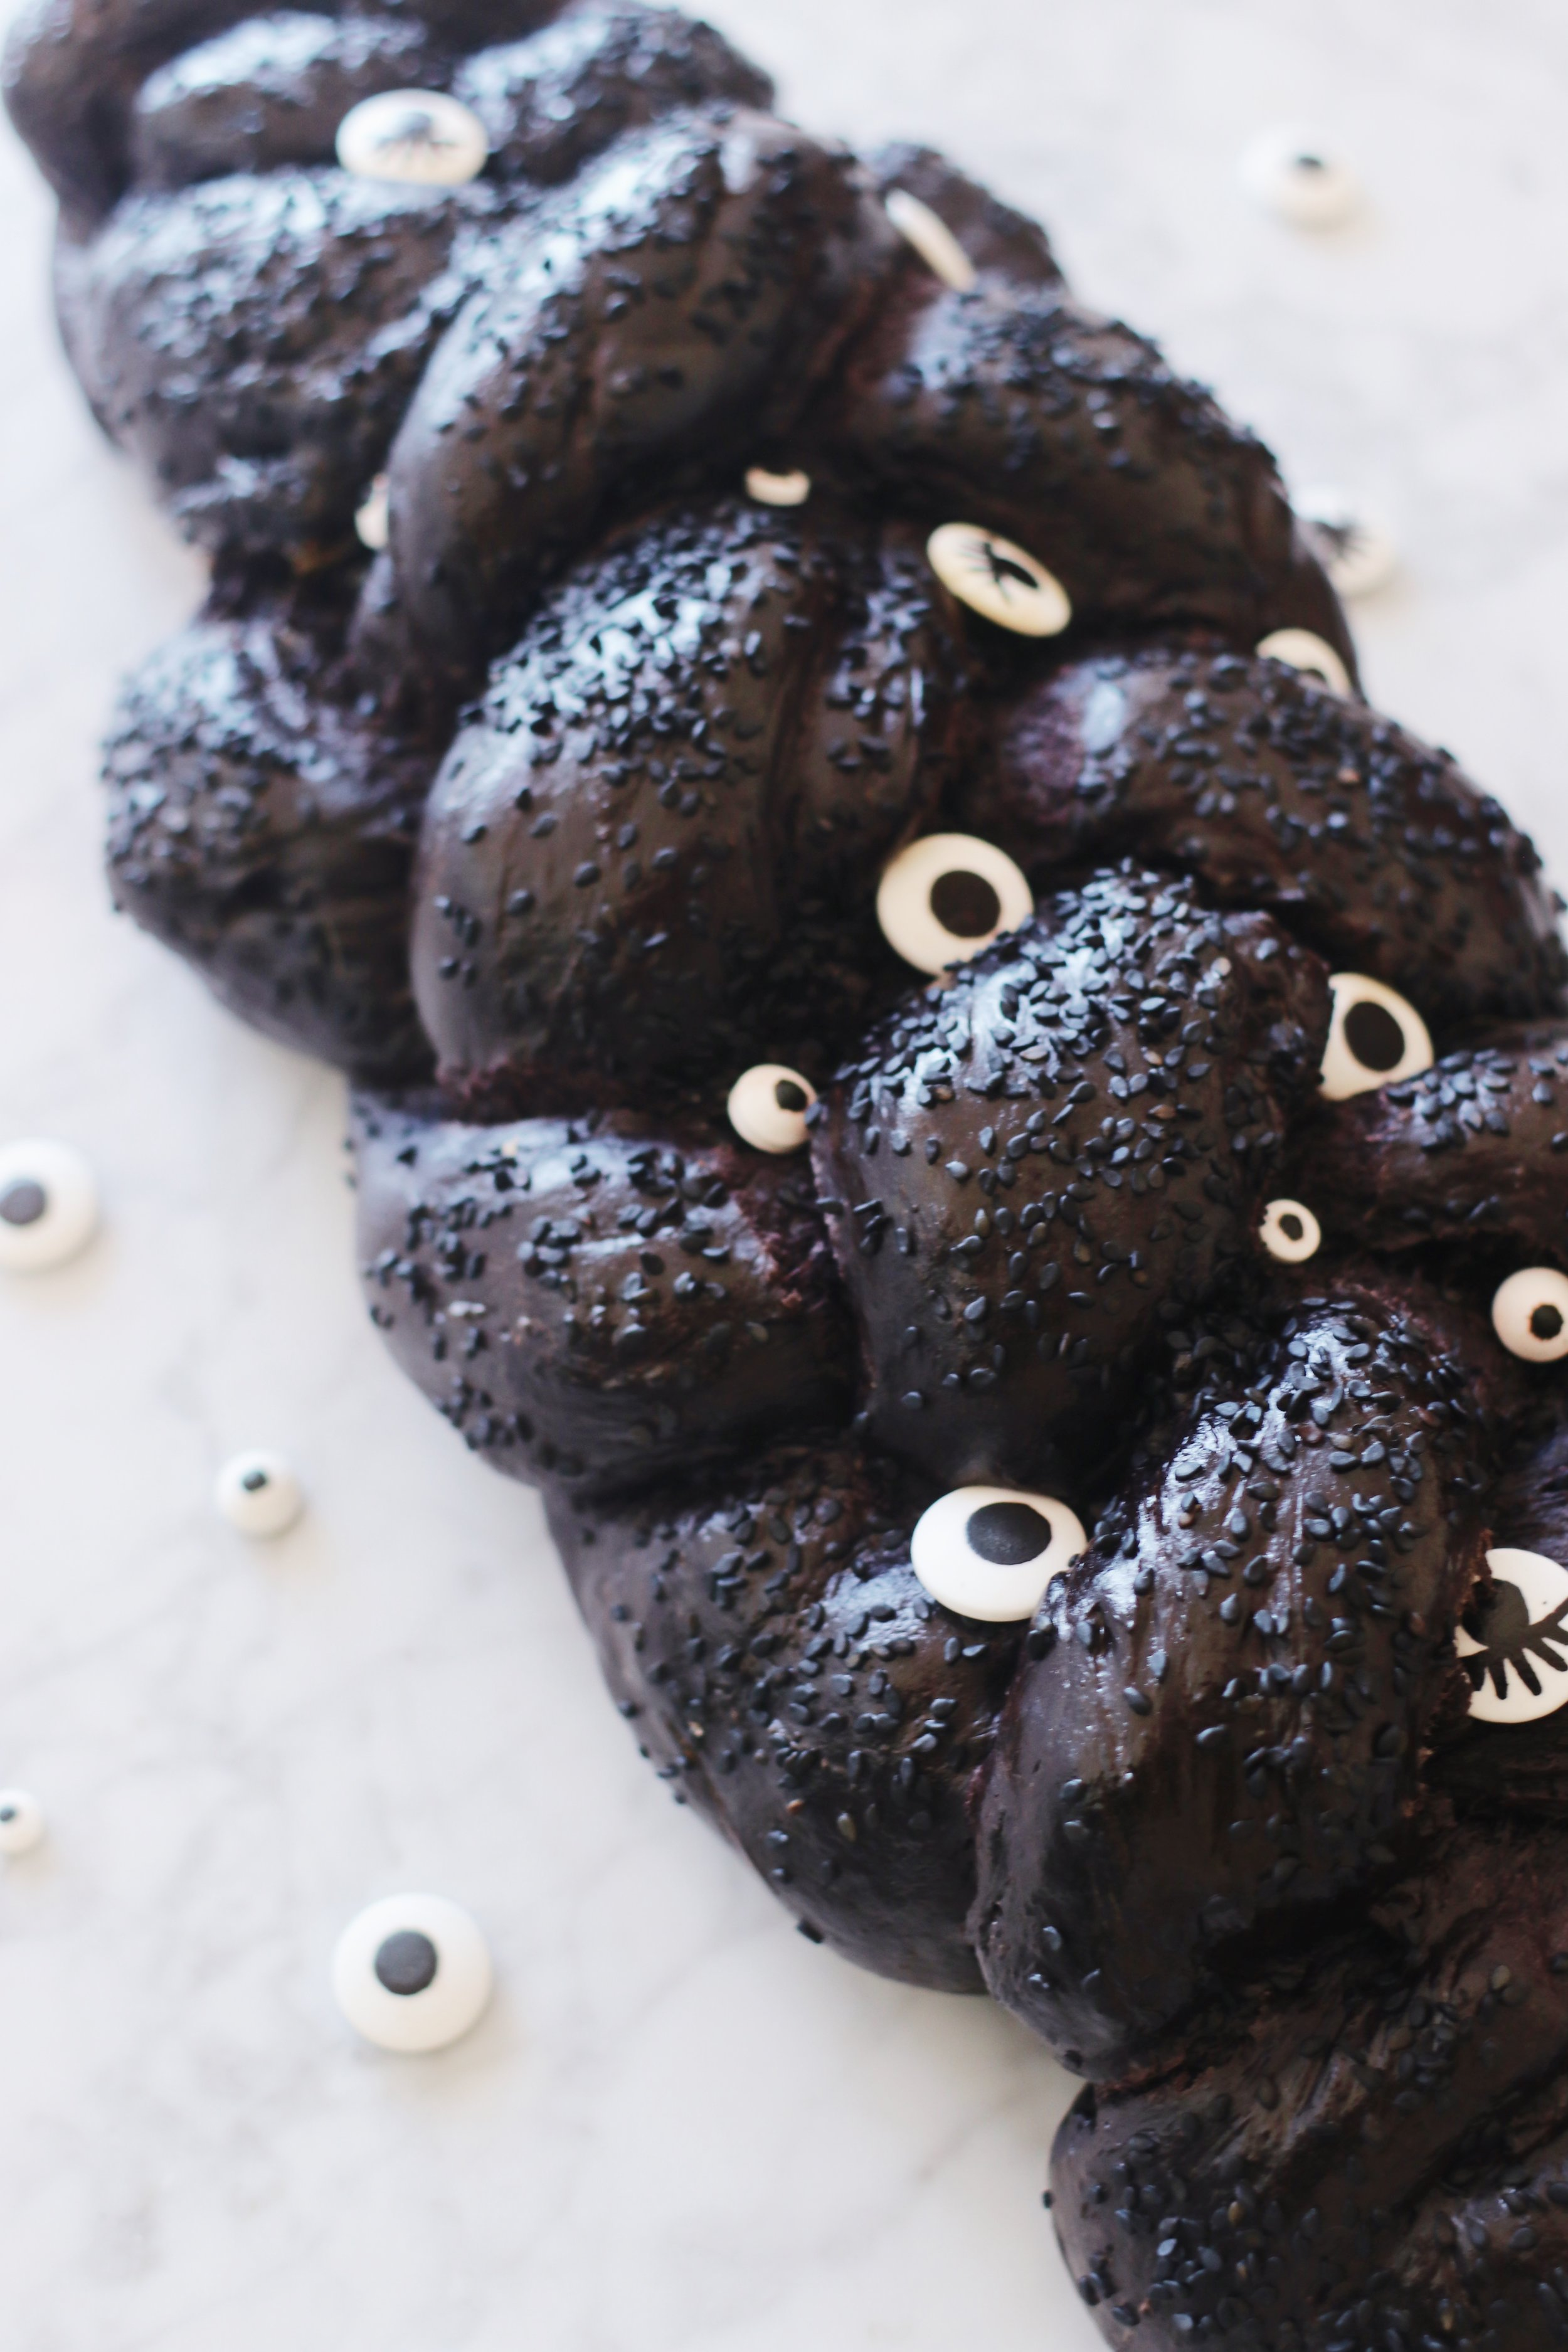 halloween-shabbat-ideas-black-challah-recipe-googly-eyes-3.JPG